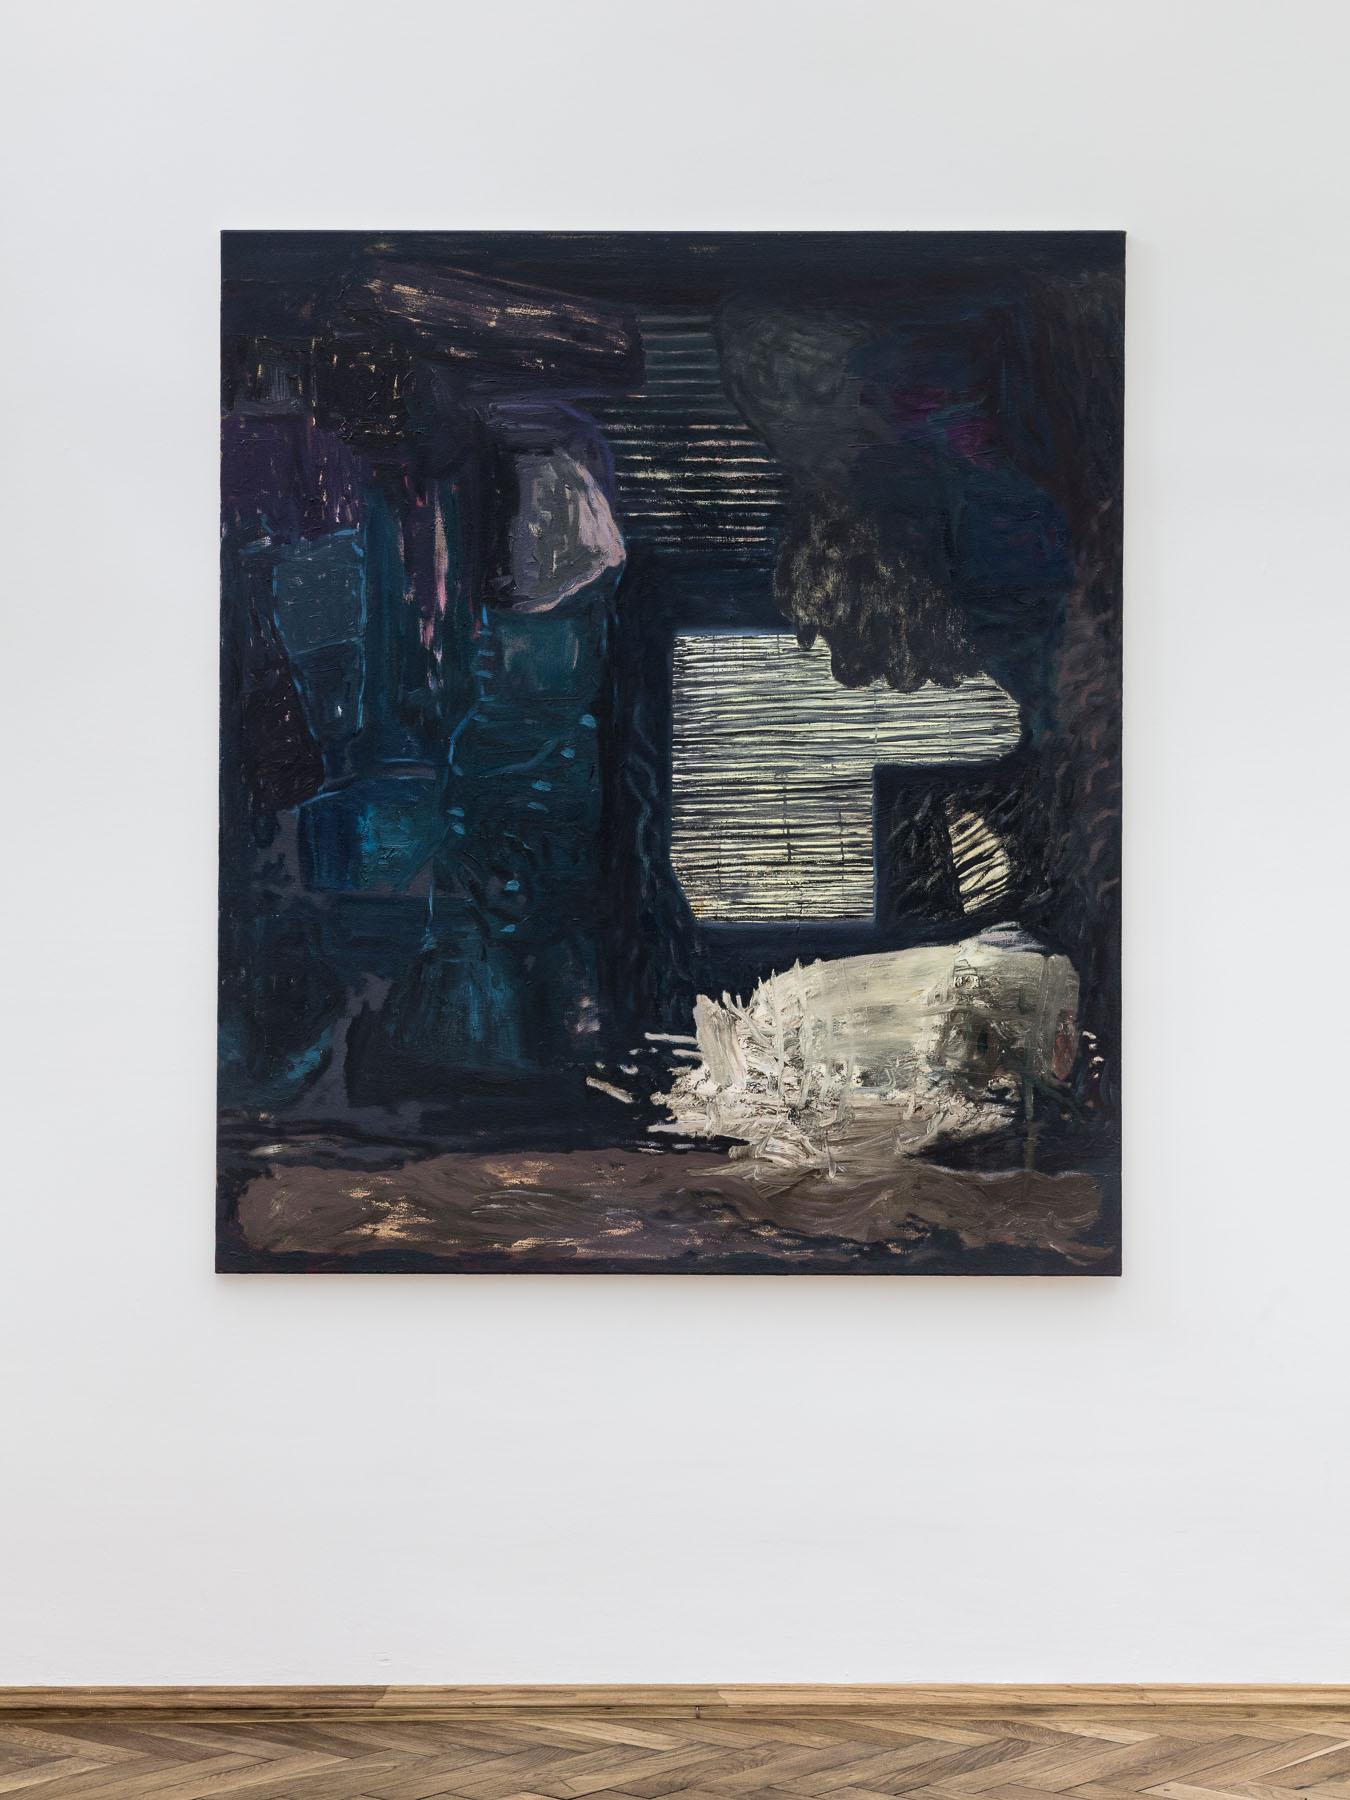 Veronika Hilger, untitled, 2016, oil on canvas, 150 x 130 cm